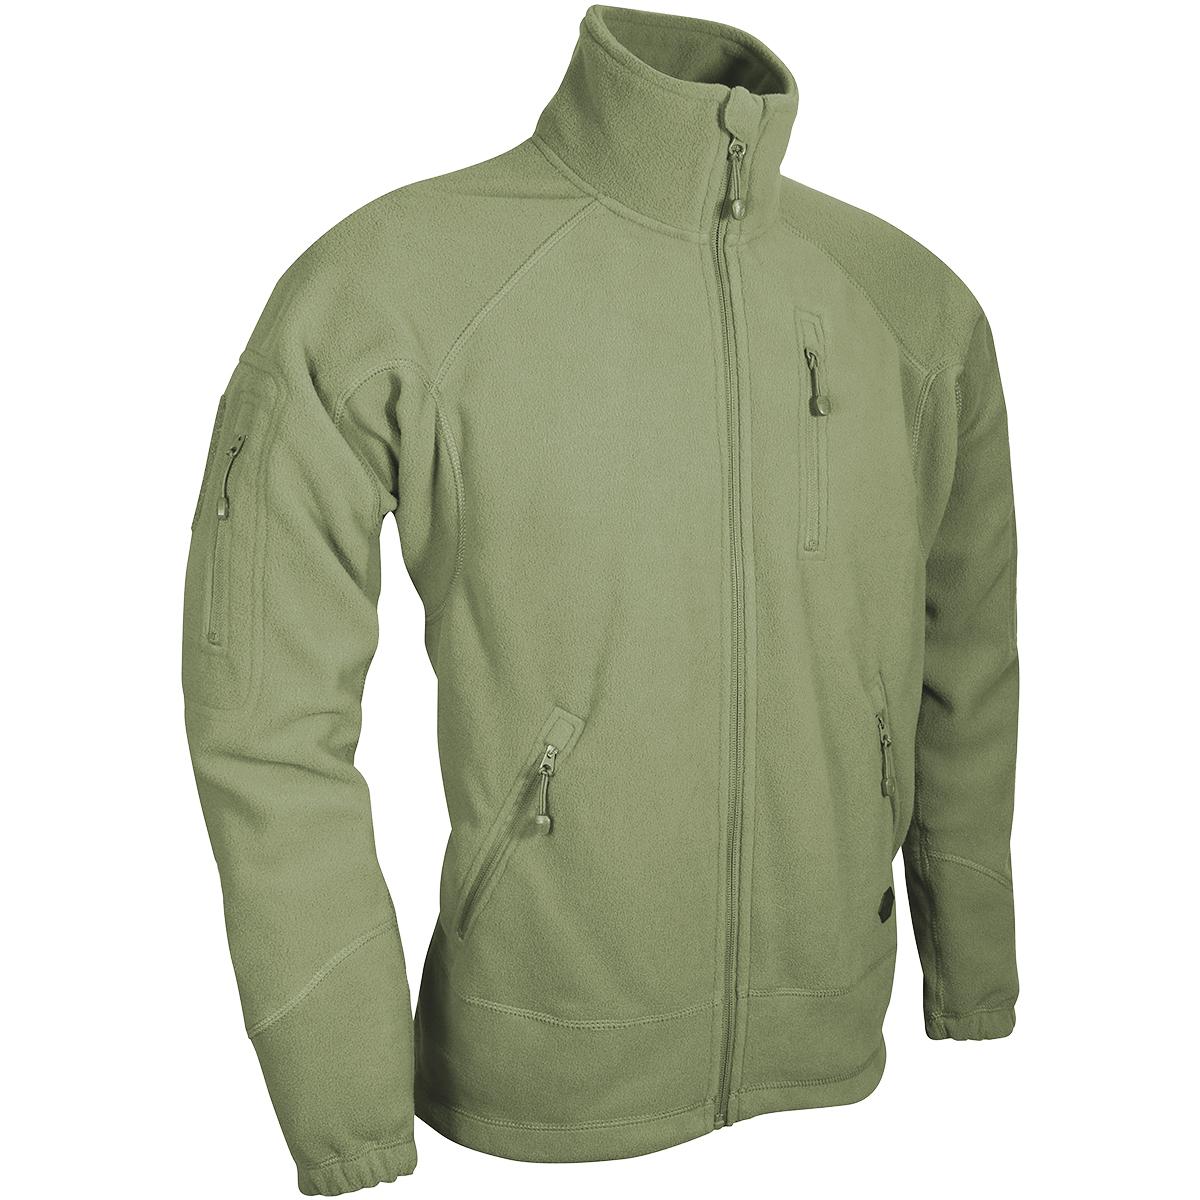 Viper Special Ops Fleece Jacket Warm Travel Sweater Mens Jumper ...